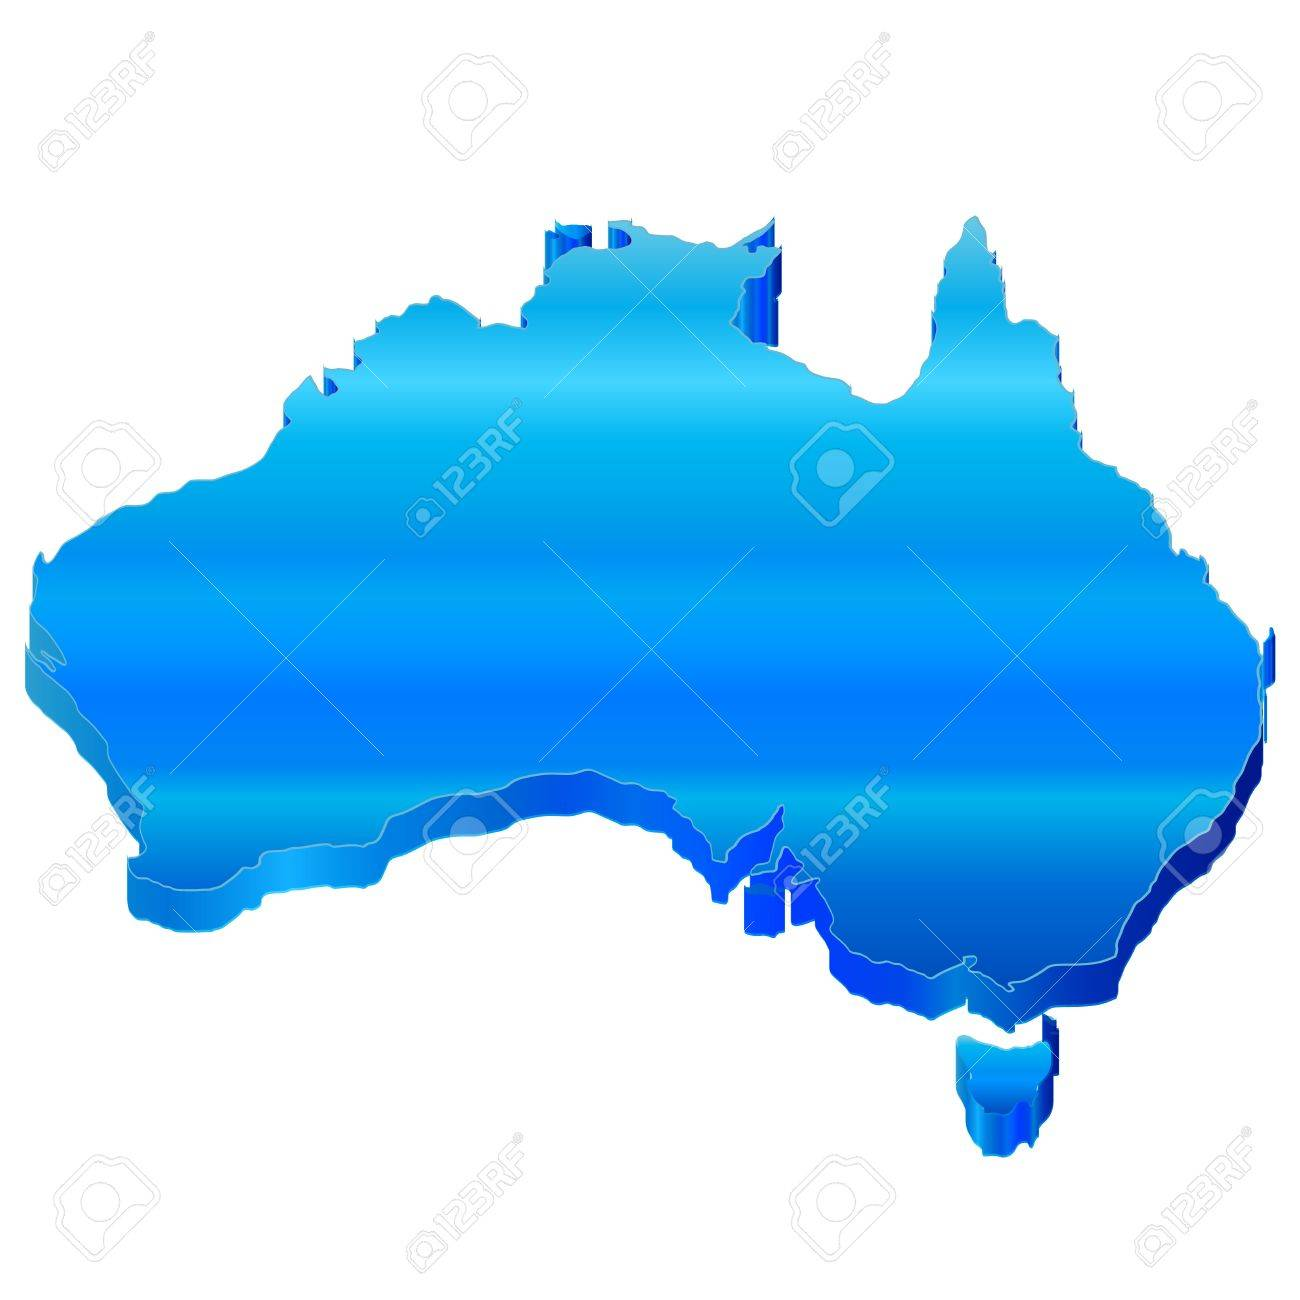 Free 3d Map Of Australia.Australia 3d Map